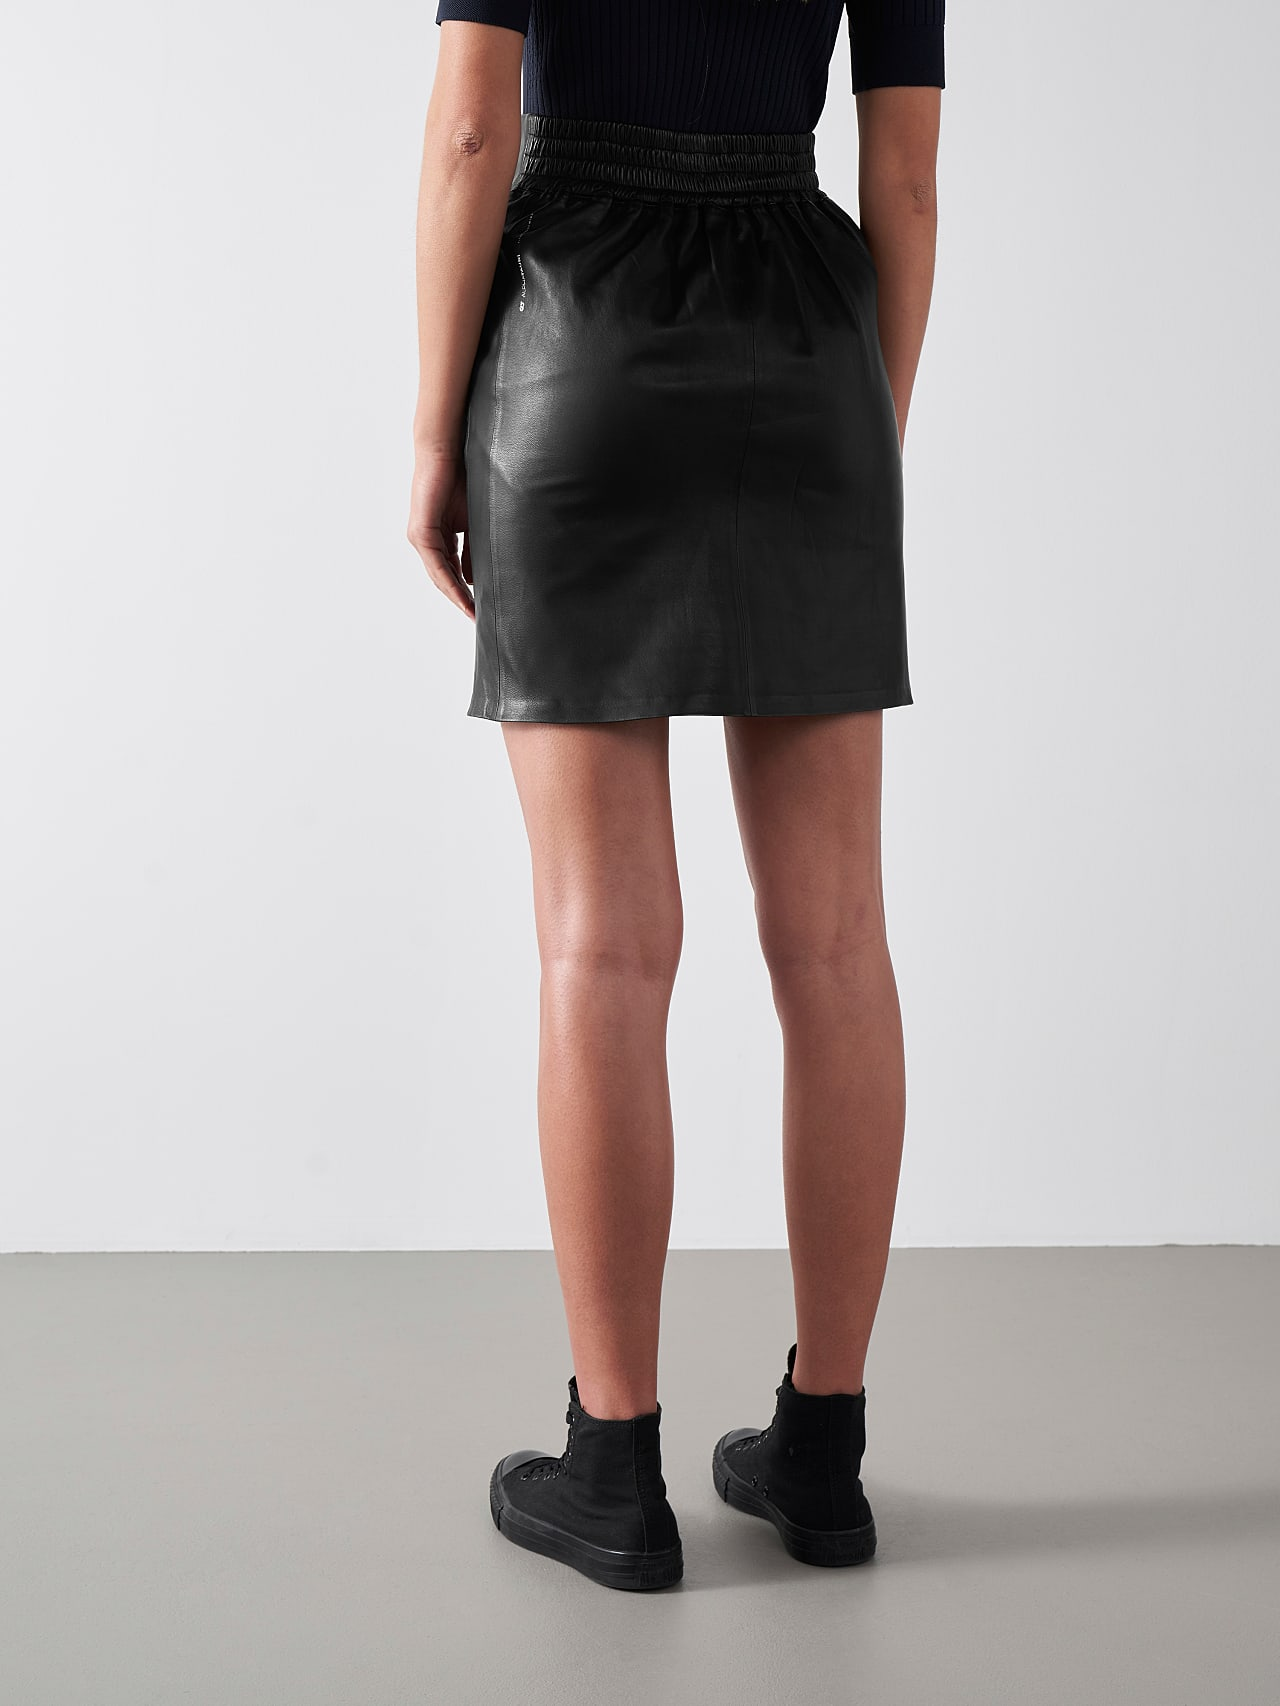 LEXSI V1.Y5.01 Leather Pencil Skirt black Front Main Alpha Tauri